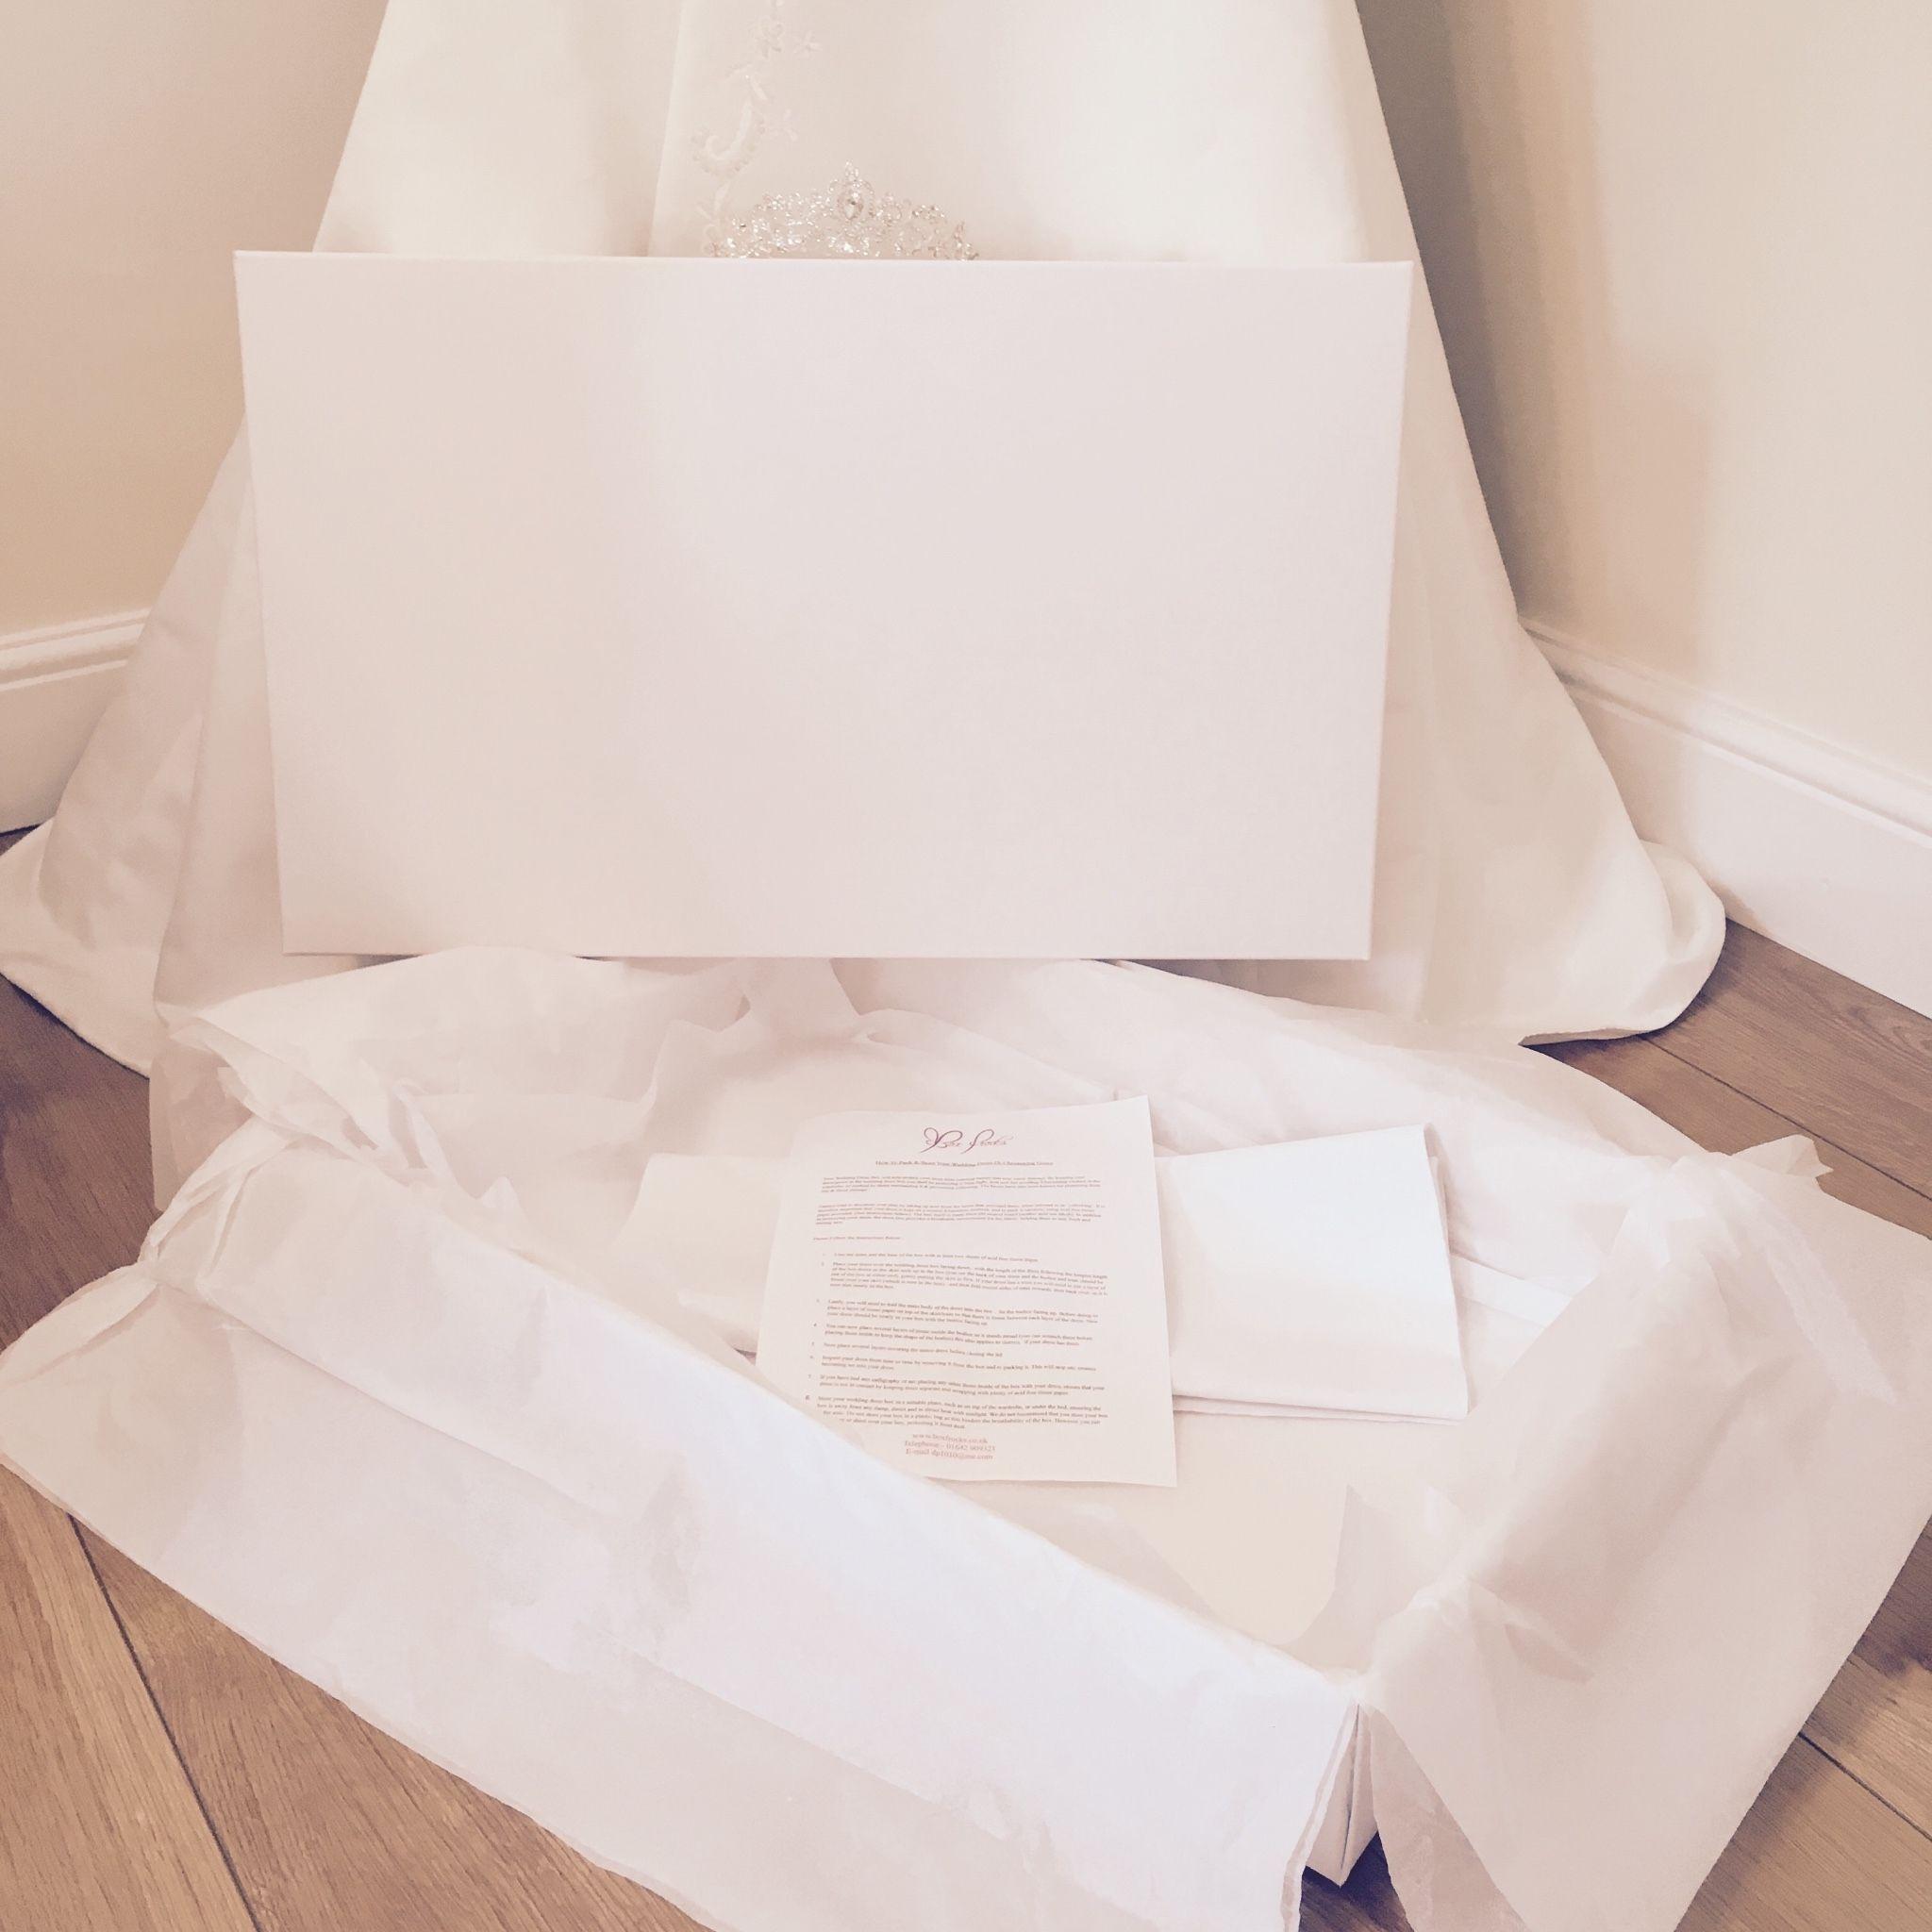 Mature bride wedding dresses  wedding dress storage box  wedding dresses for the mature bride